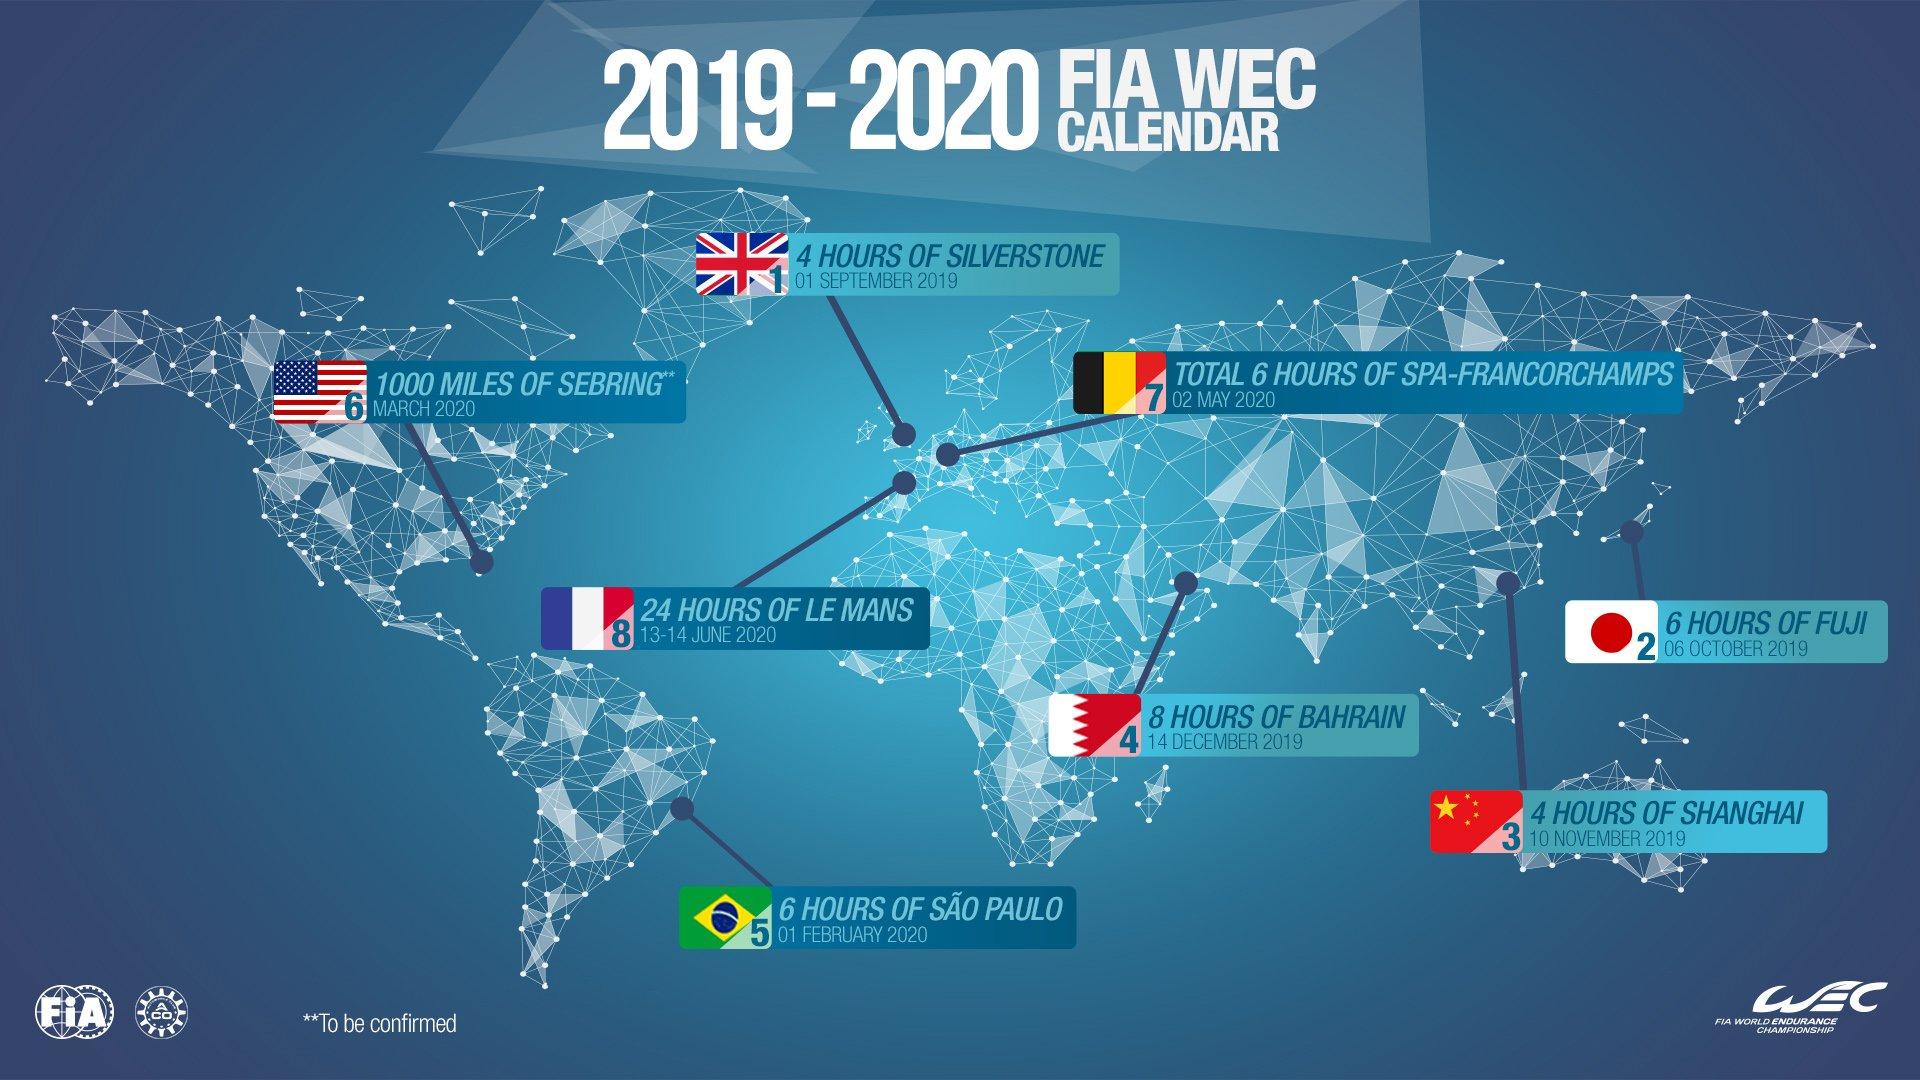 F1 Schedule 2019: Formula One Grand Prix World Championship Races F1 Calendar 2019 Channel 4